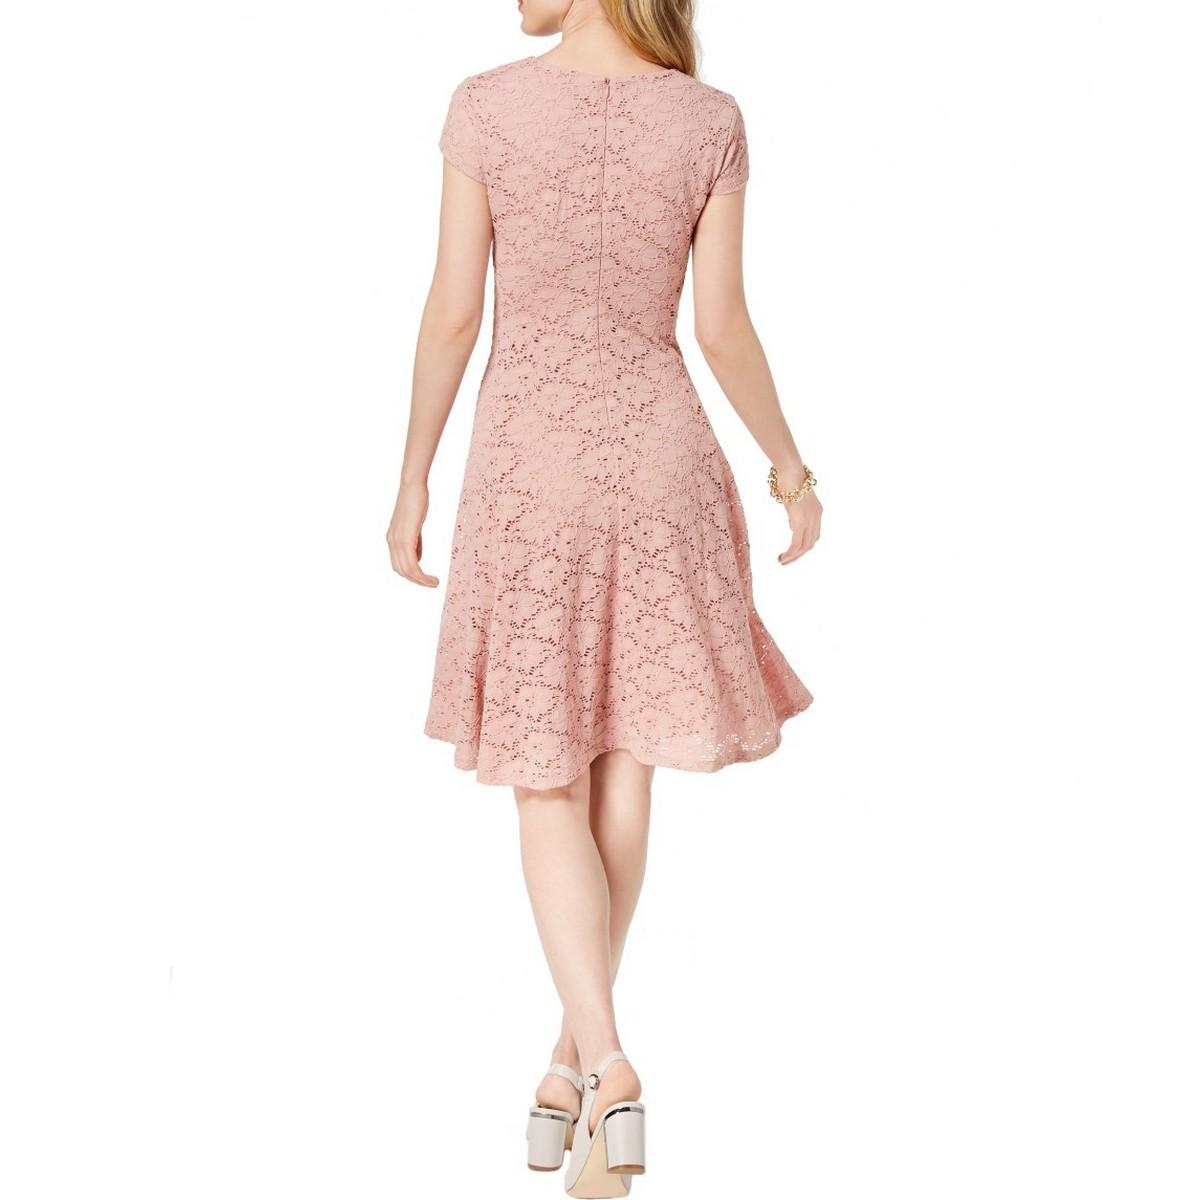 ALFANI-NEW-Women-039-s-Lace-Cap-Sleeves-Above-Knee-Fit-amp-Flare-Dress-TEDO thumbnail 6